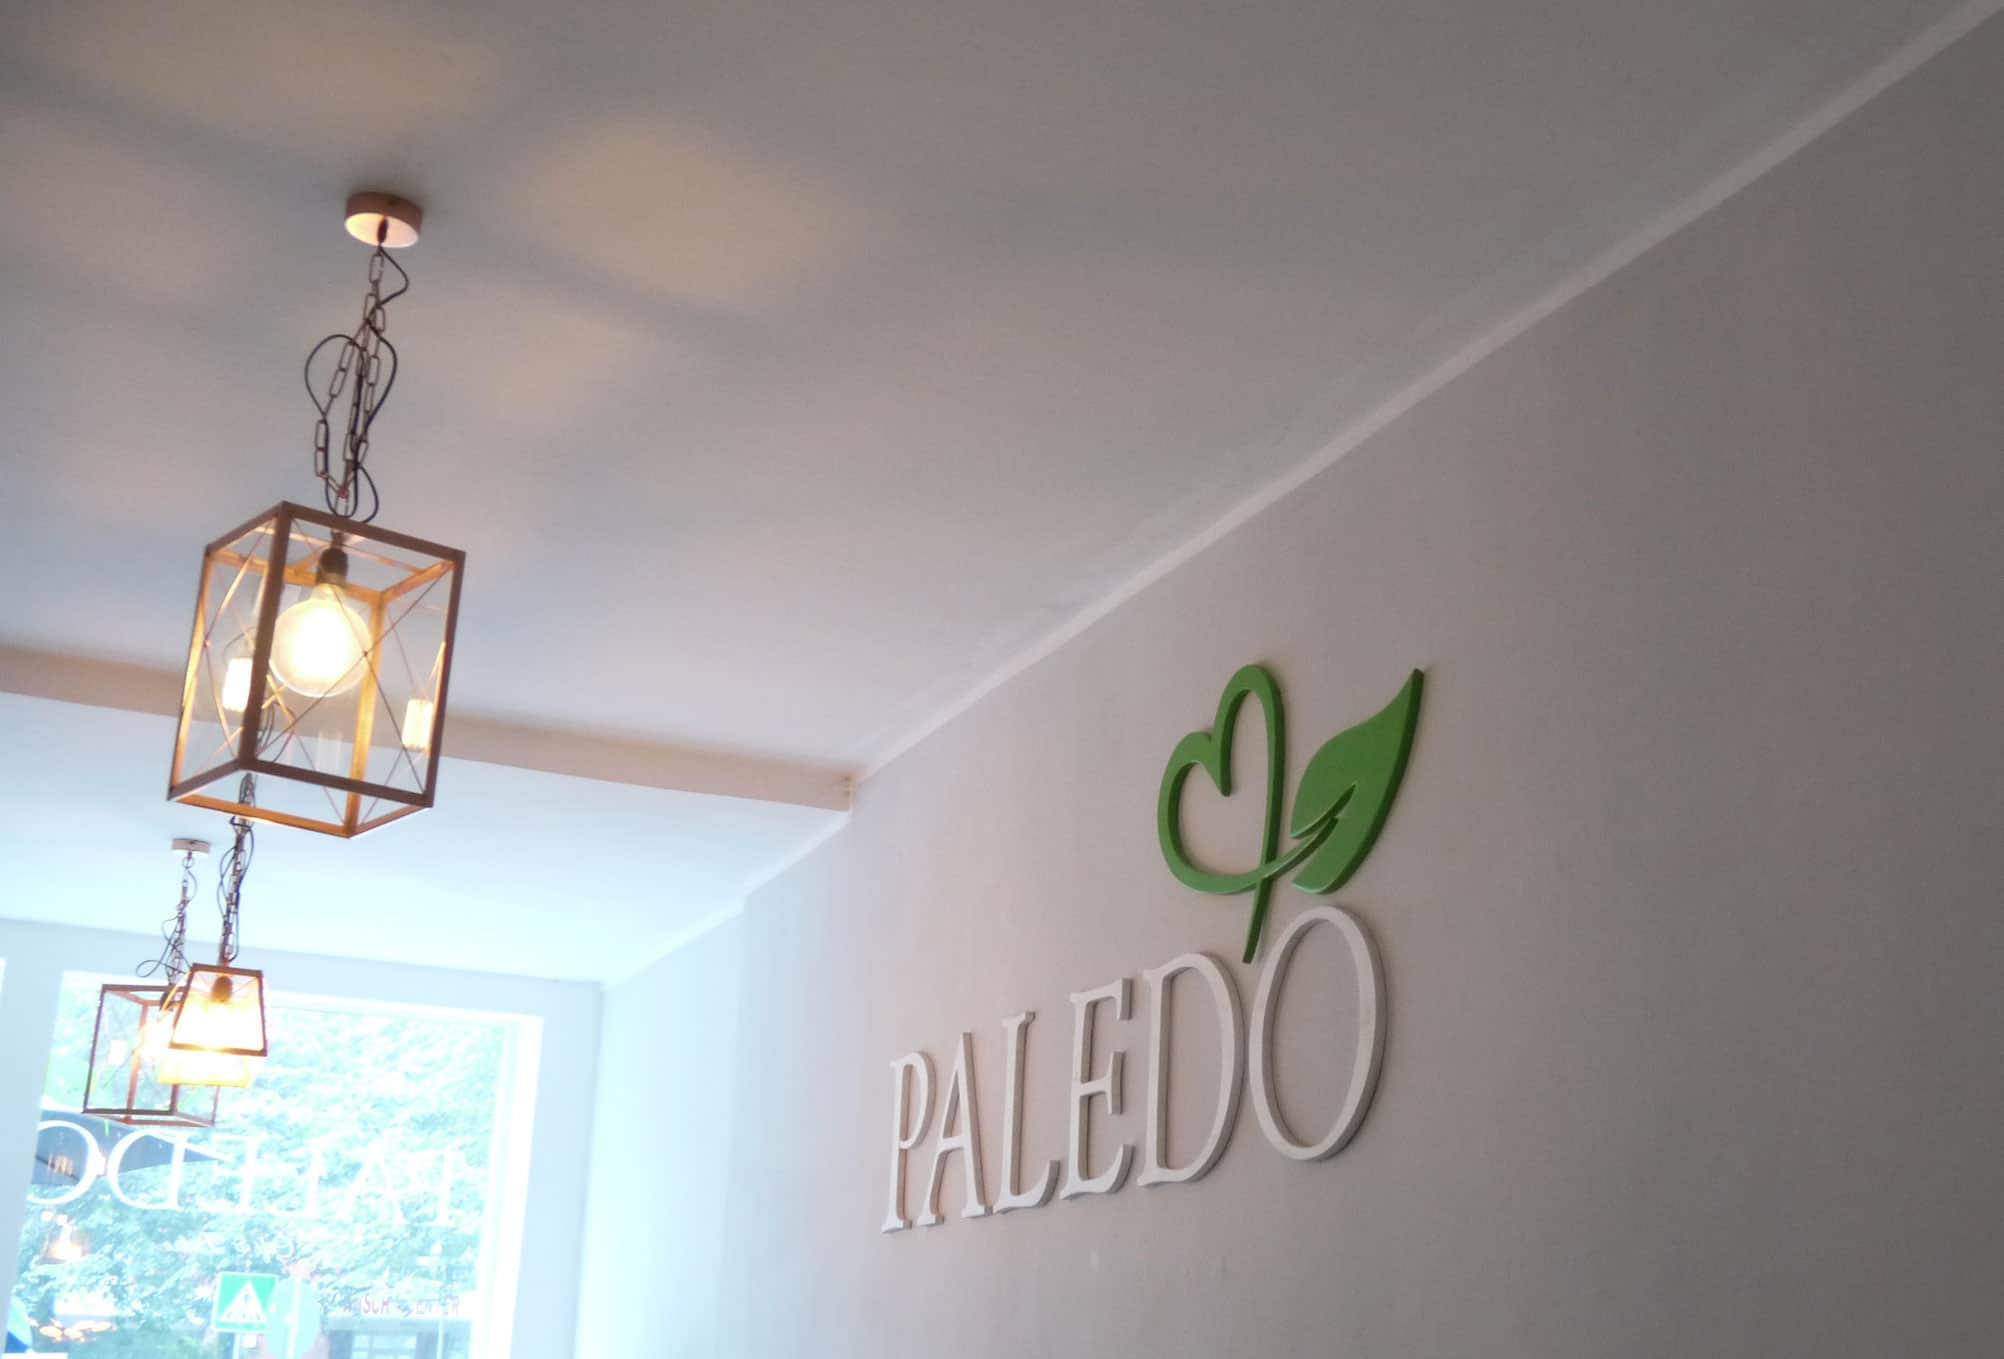 Restaurant Paledo in Hamburg